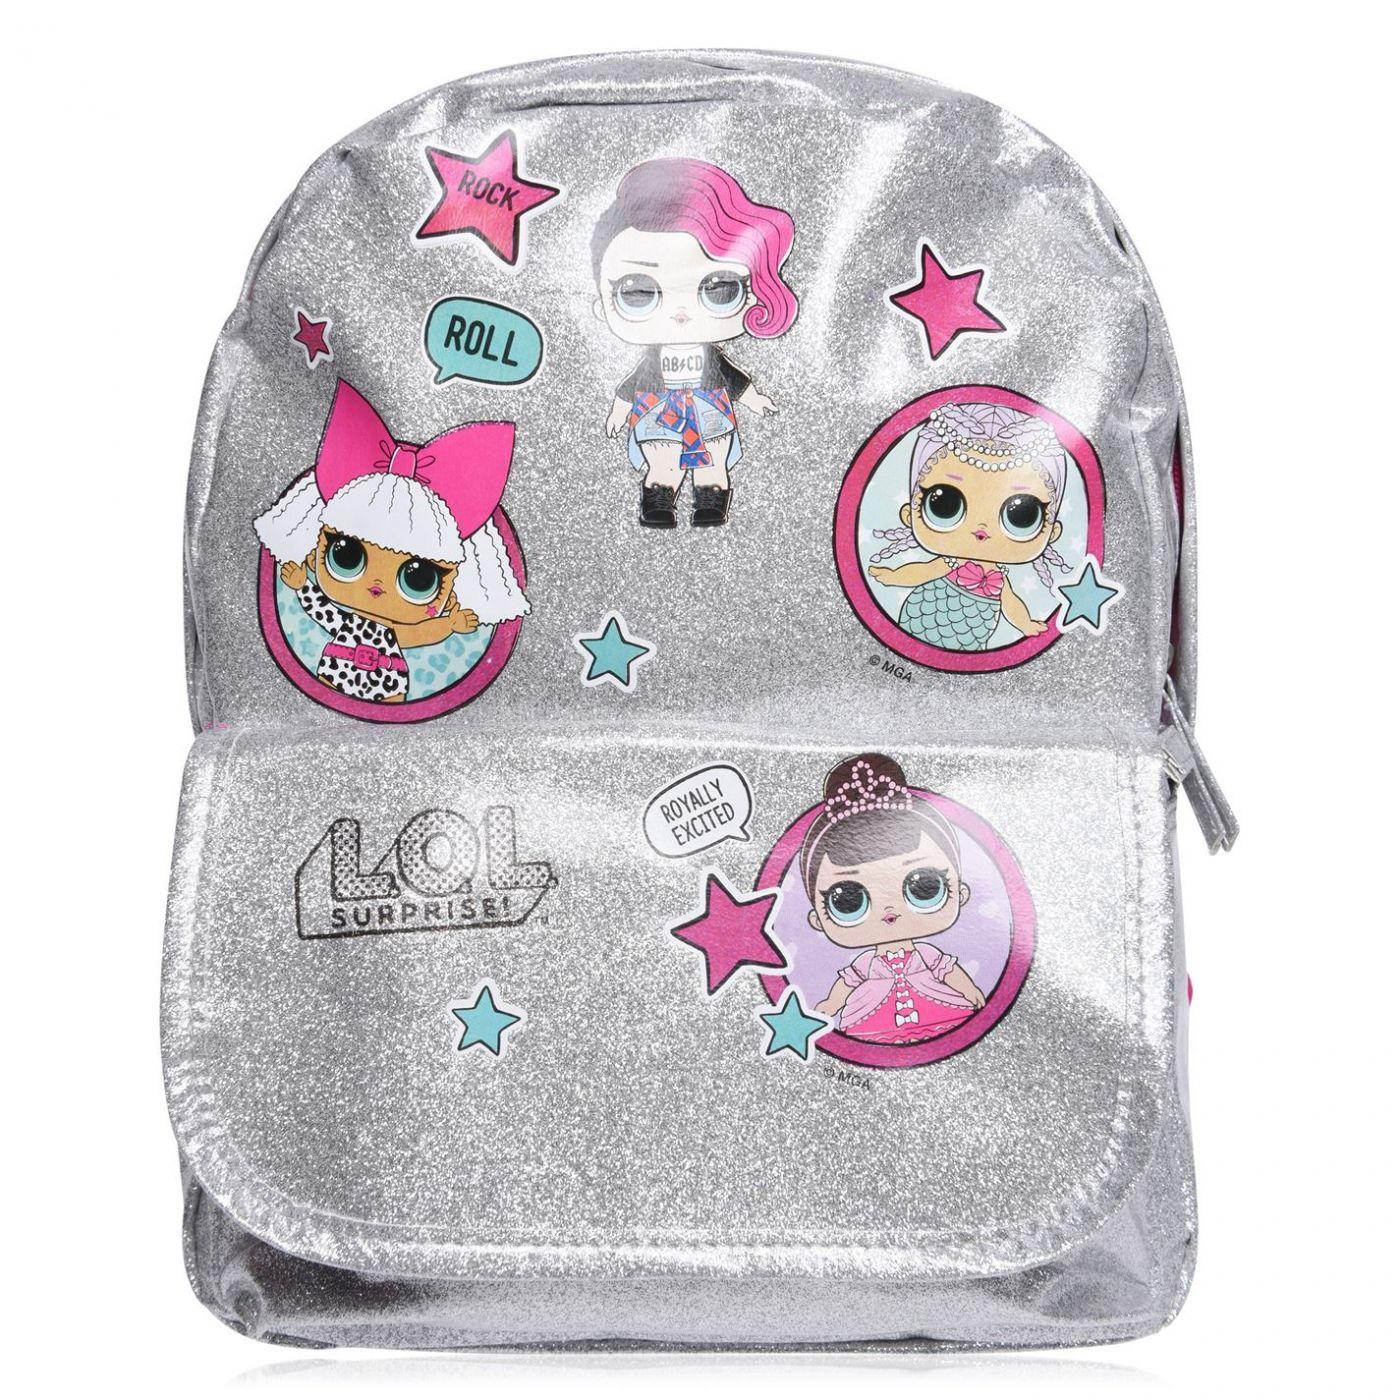 Character LOL Premium Backpack